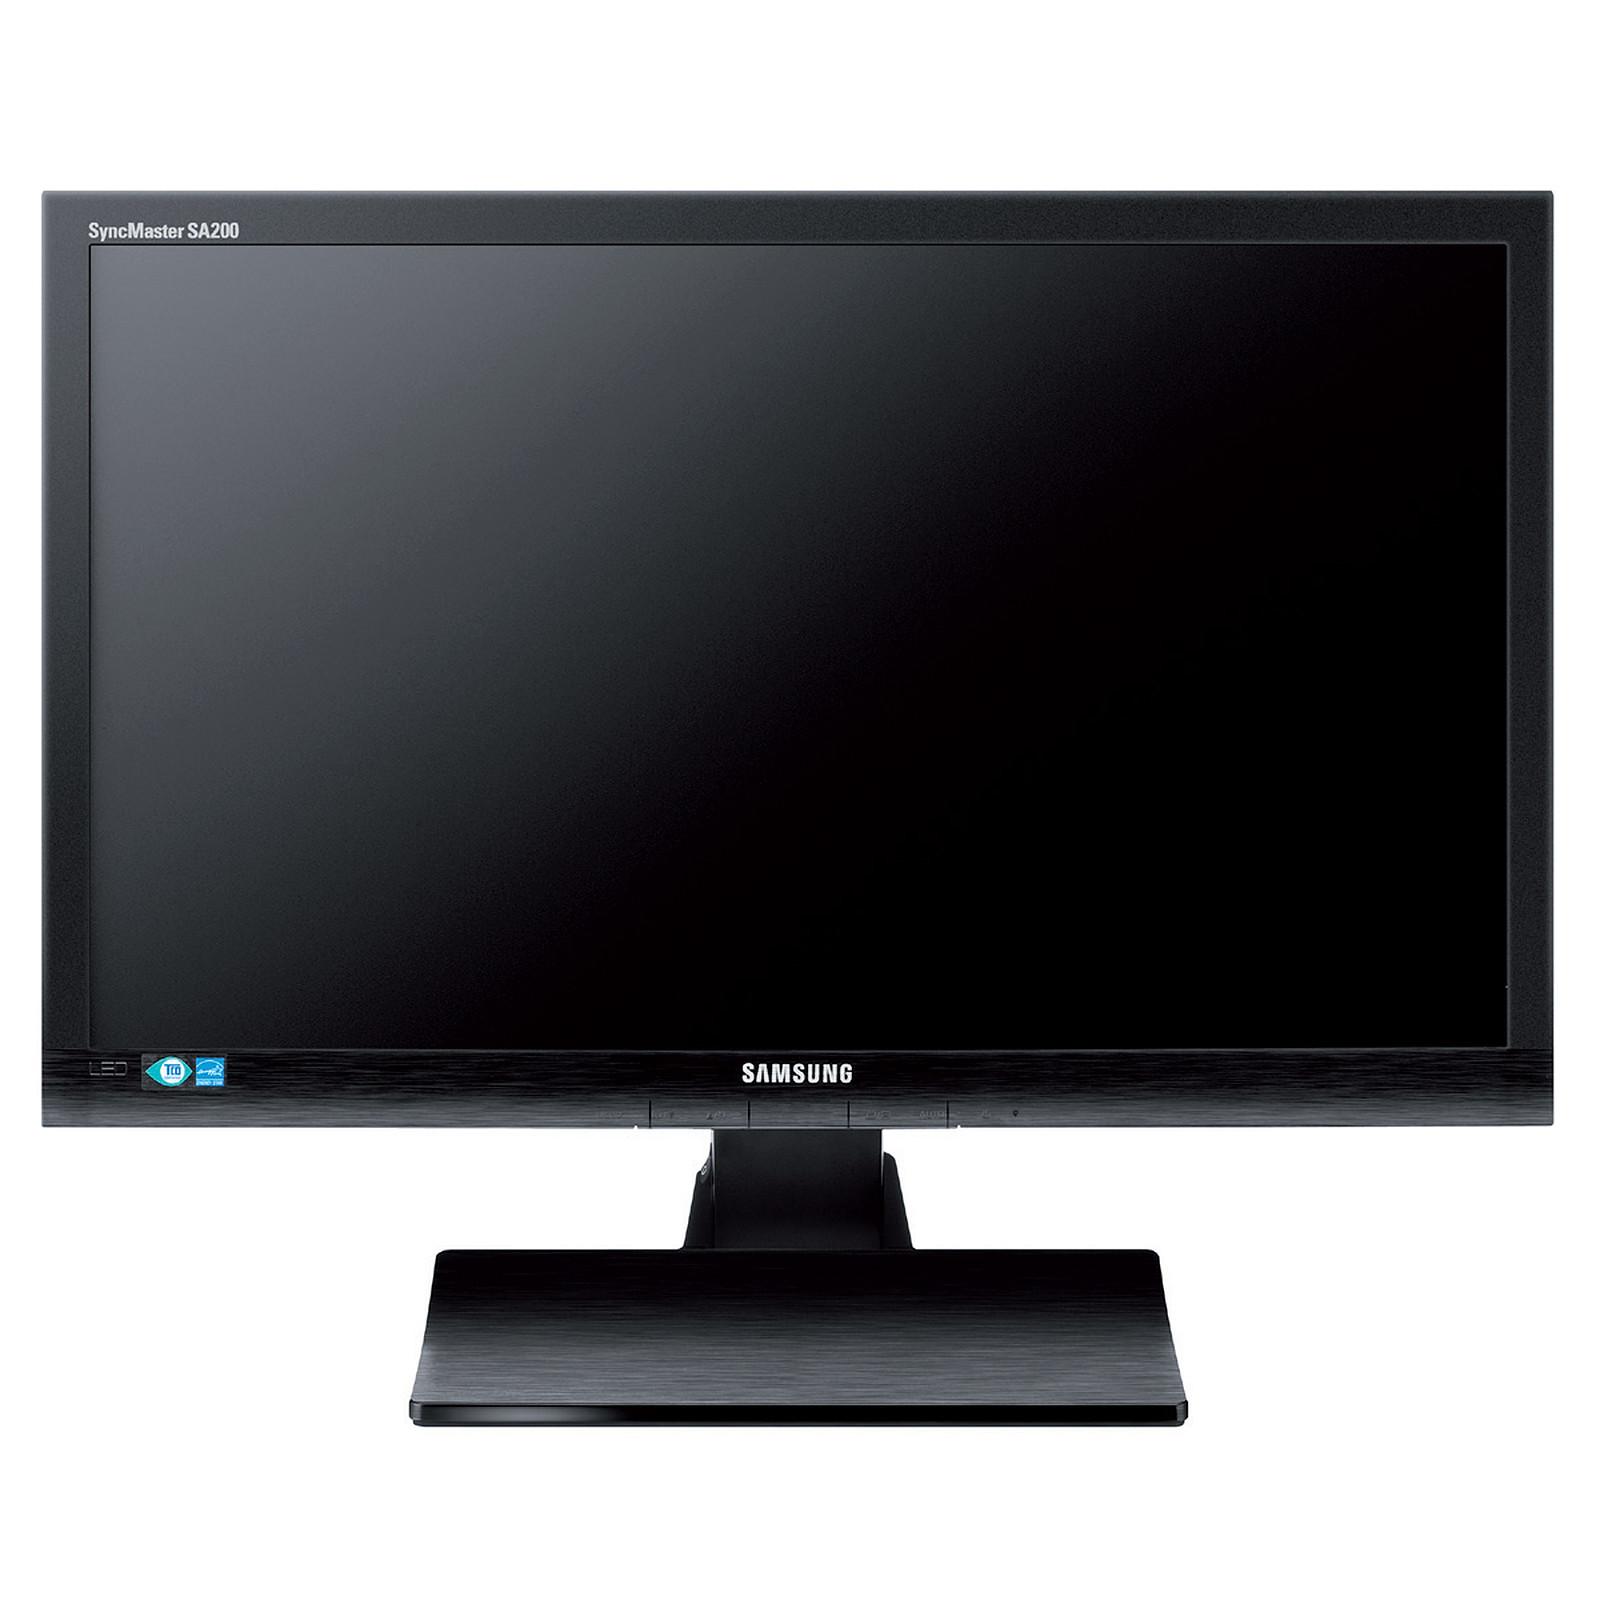 "Samsung 22"" LED - S22A450MW"